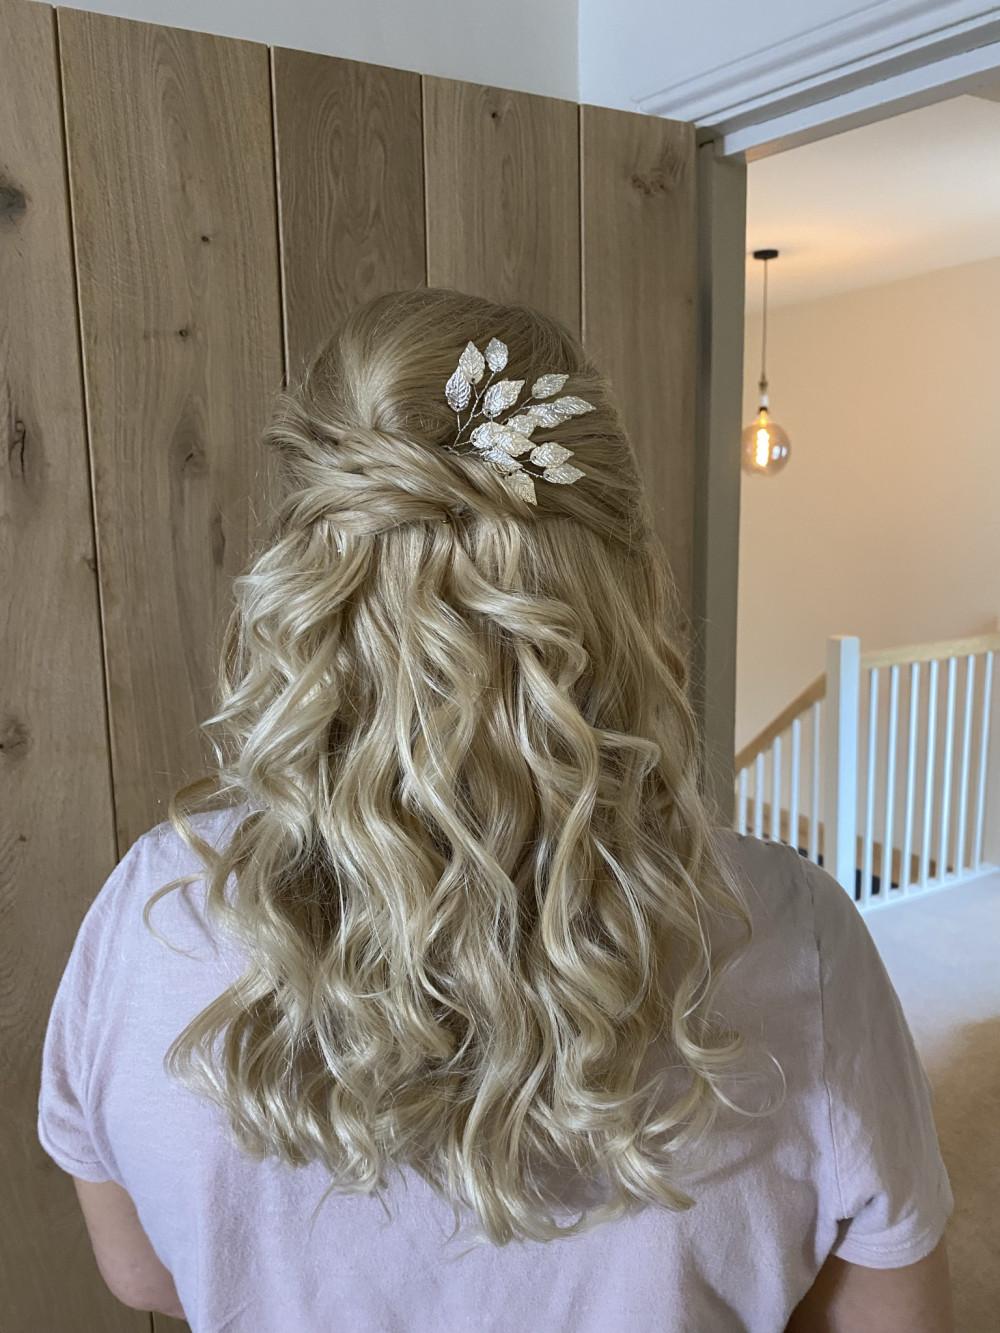 - Make Me Bridal Artist: Celfie Hair and Makeup. #bridalmakeup #bridesmaidhair #bridesmaidhair #bridesmaidhairandmakeup #bridesmaidcurls